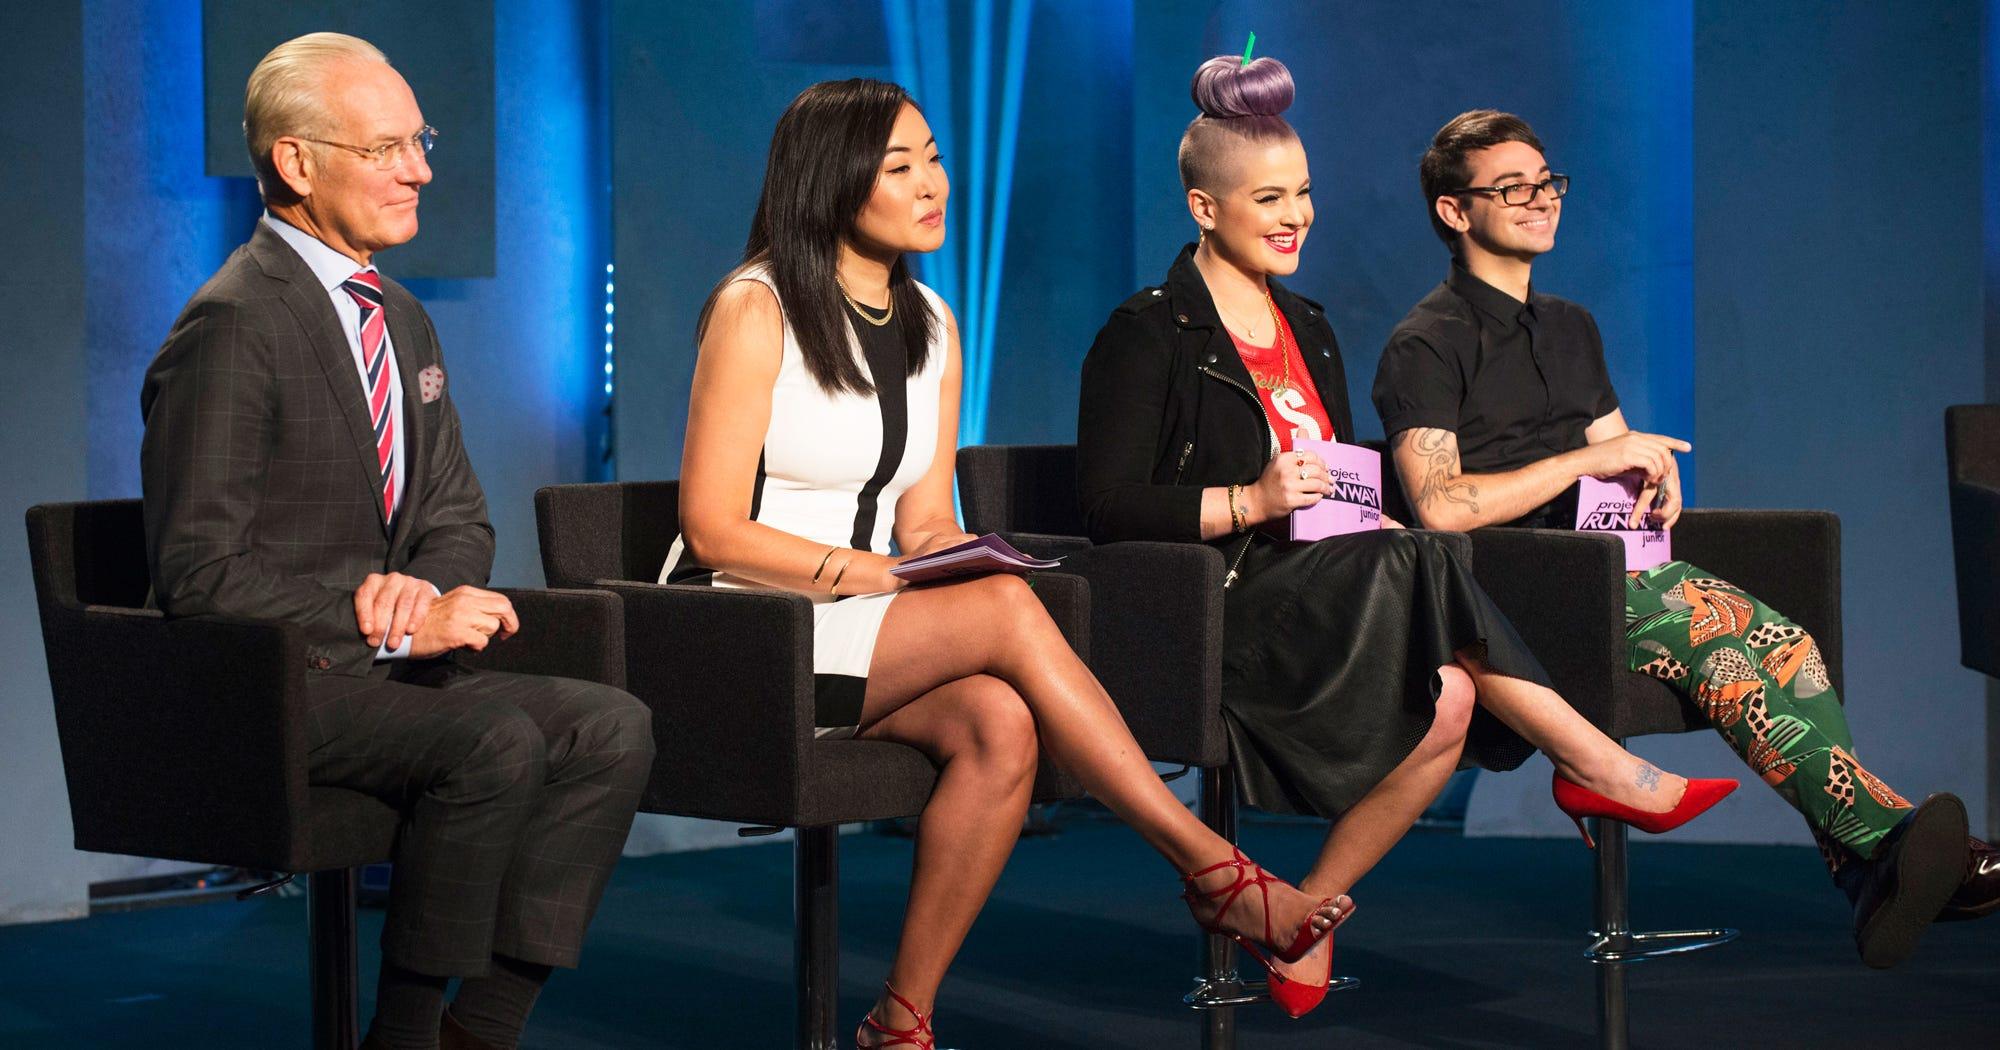 Project Runway Junior Recaptures The Heart Of Reality TV